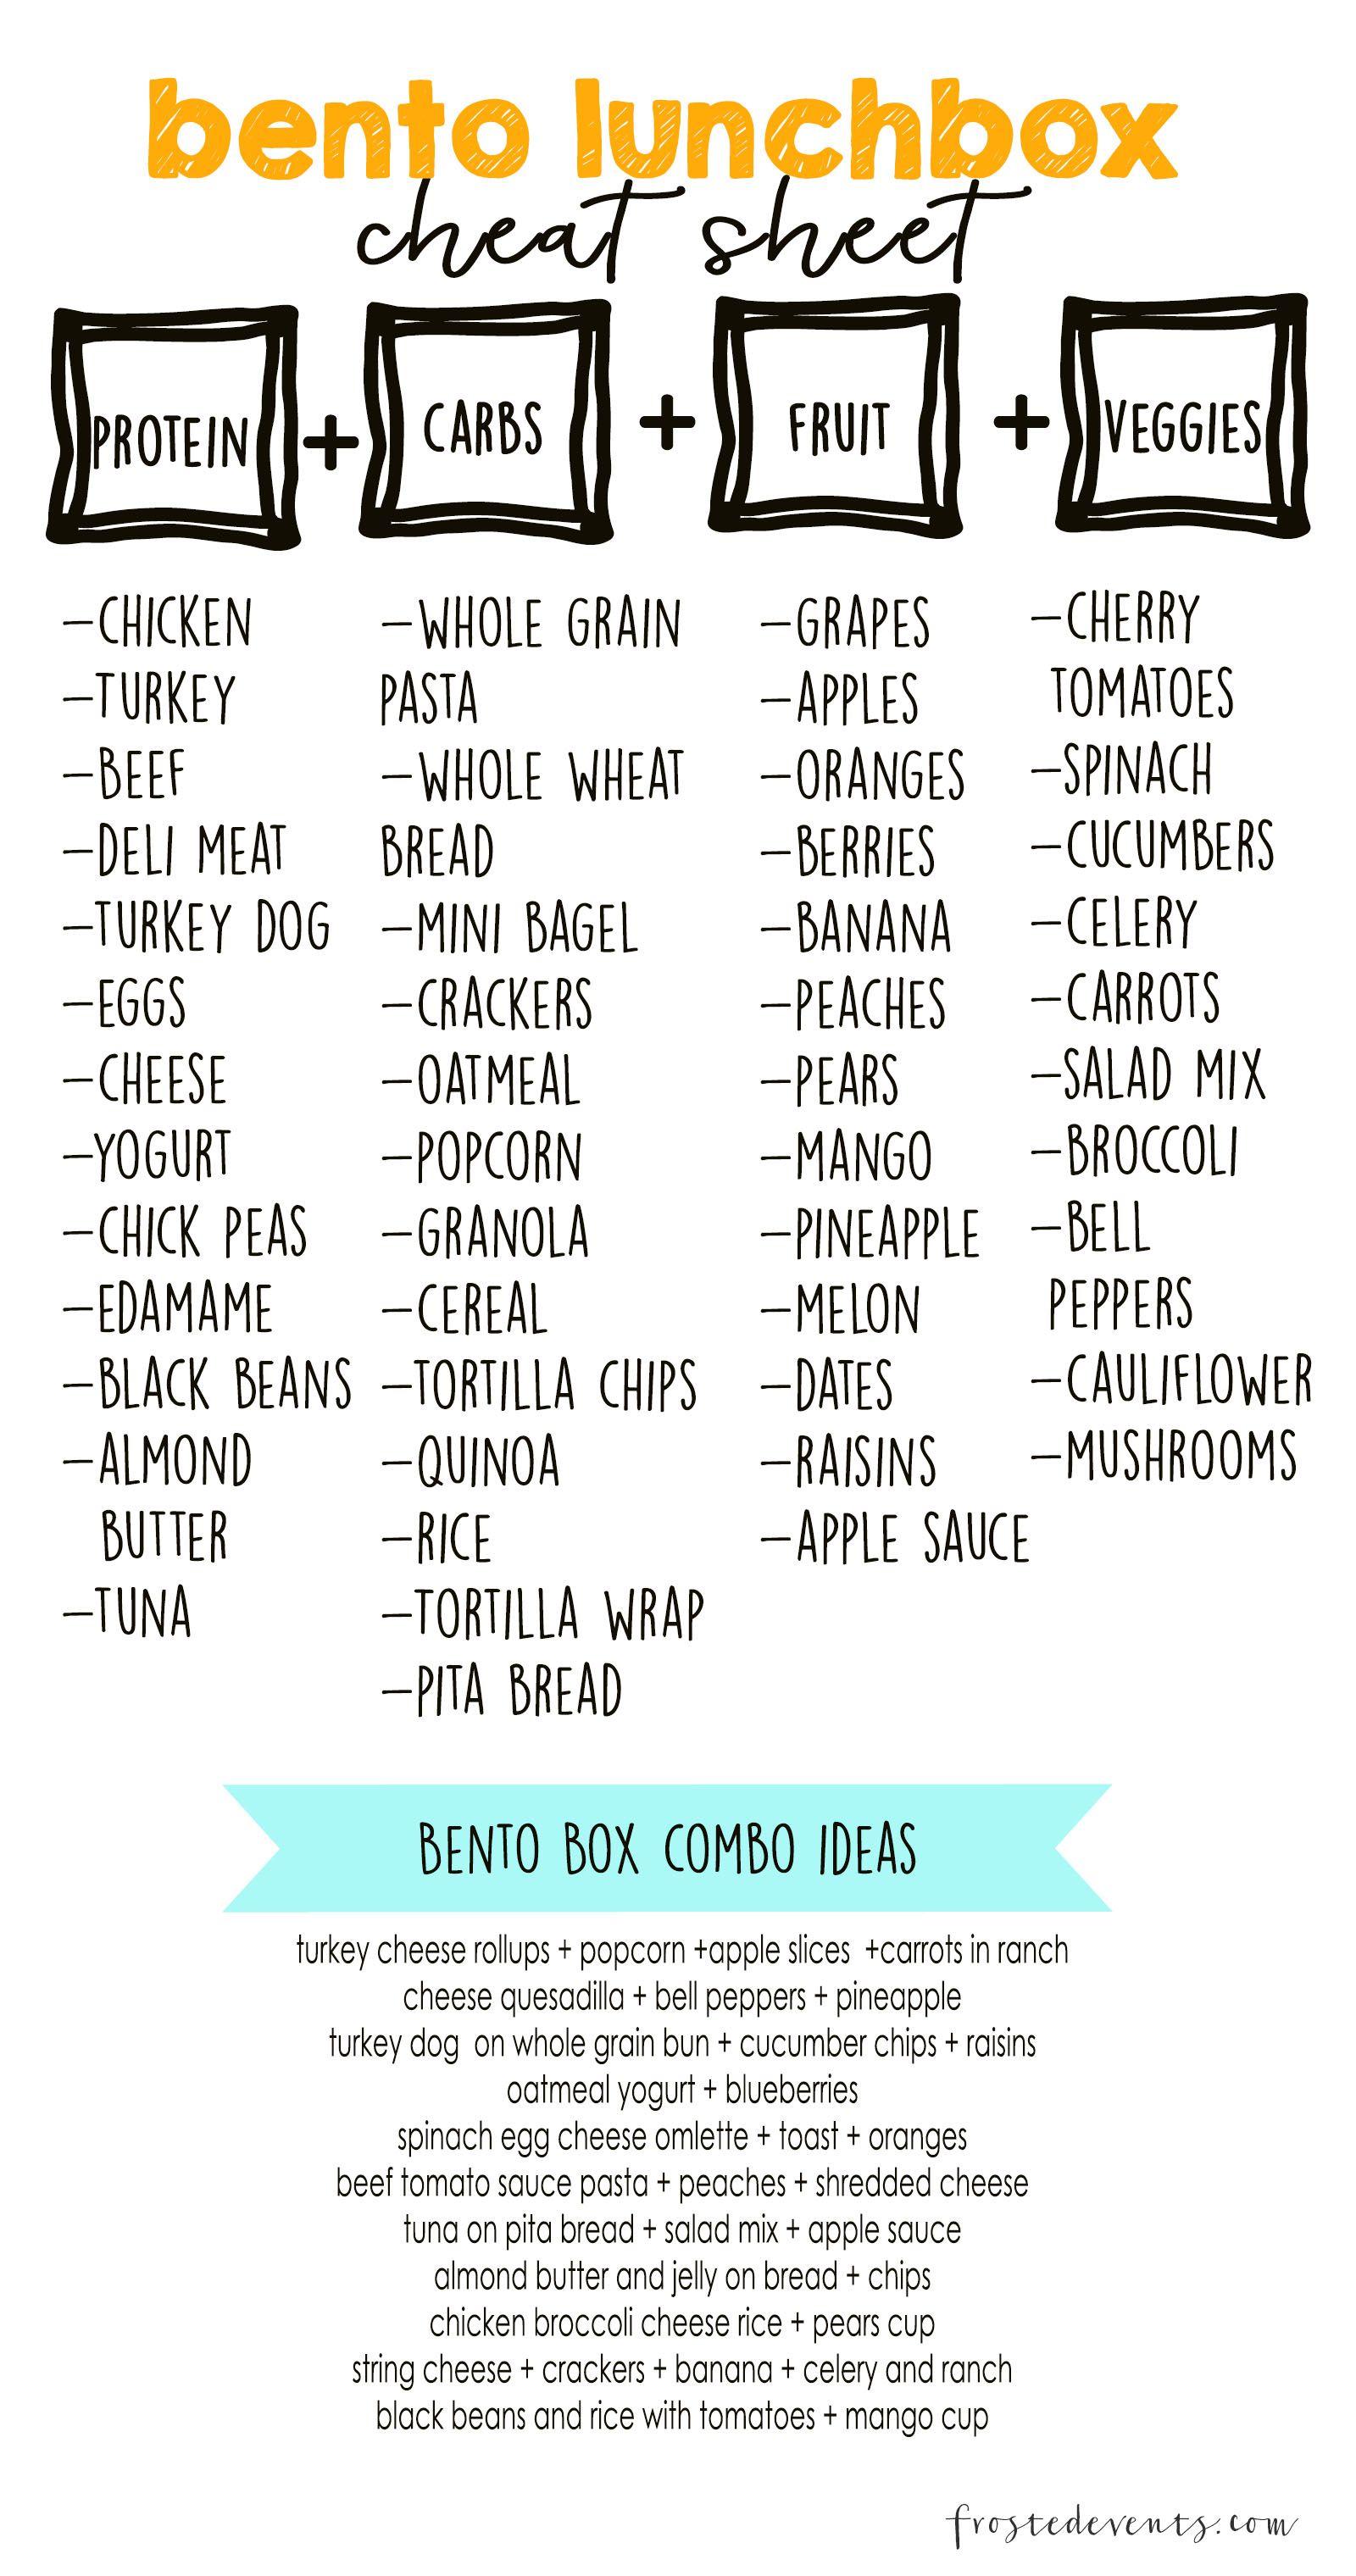 Bento Box Lunch Ideas + Cheat Sheet